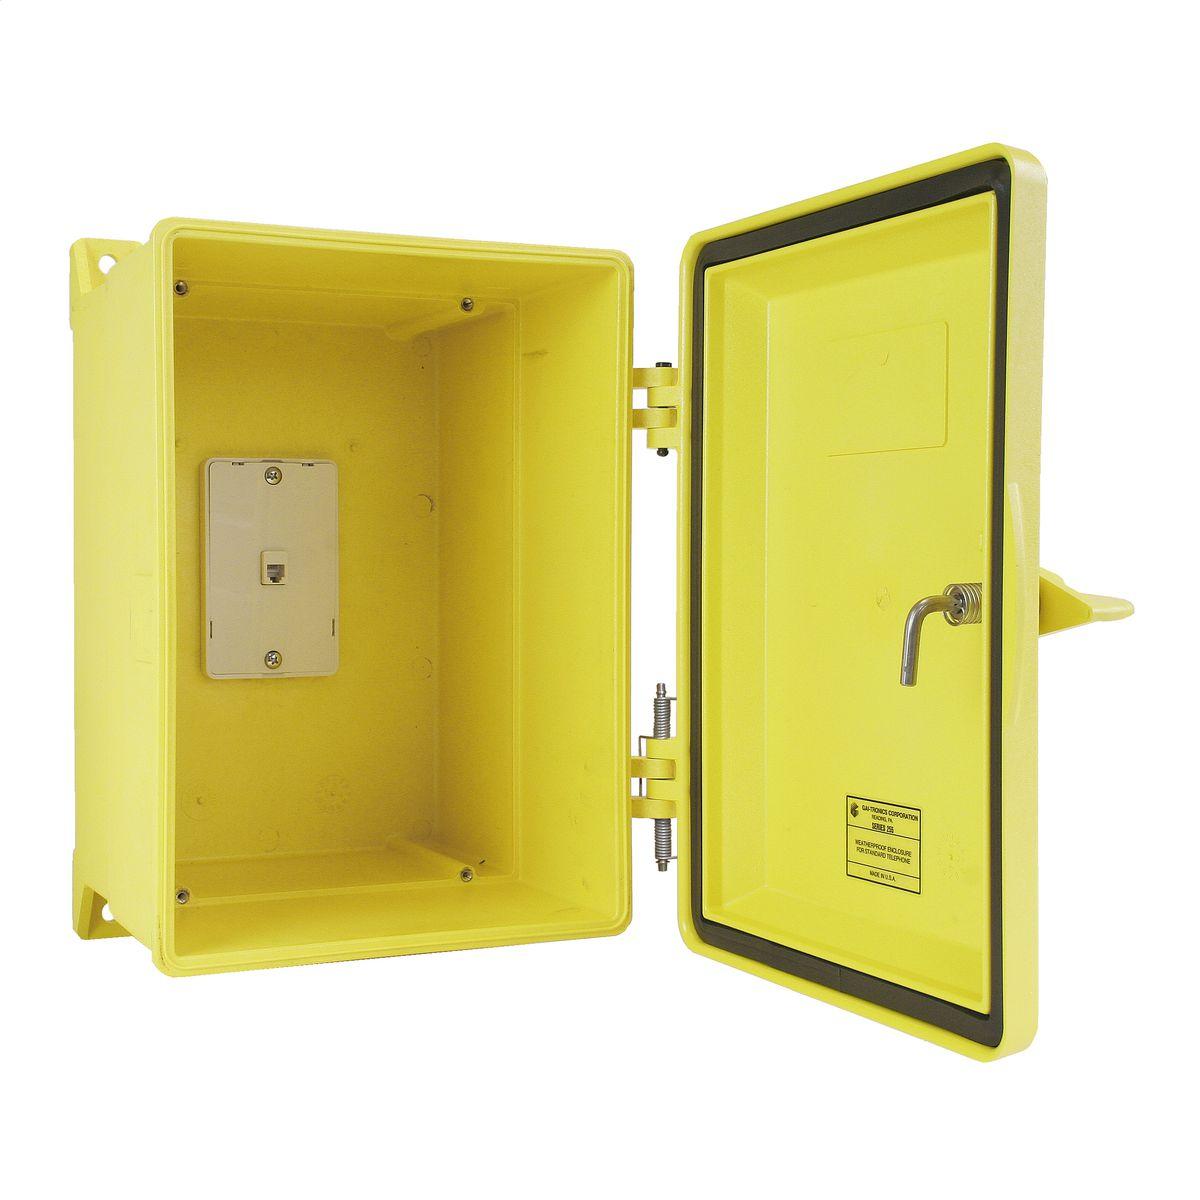 Weatherproof Telephone Enclosure  sc 1 st  Hubbell & Weatherproof Telephone Enclosure | Brand | GAI-Tronics